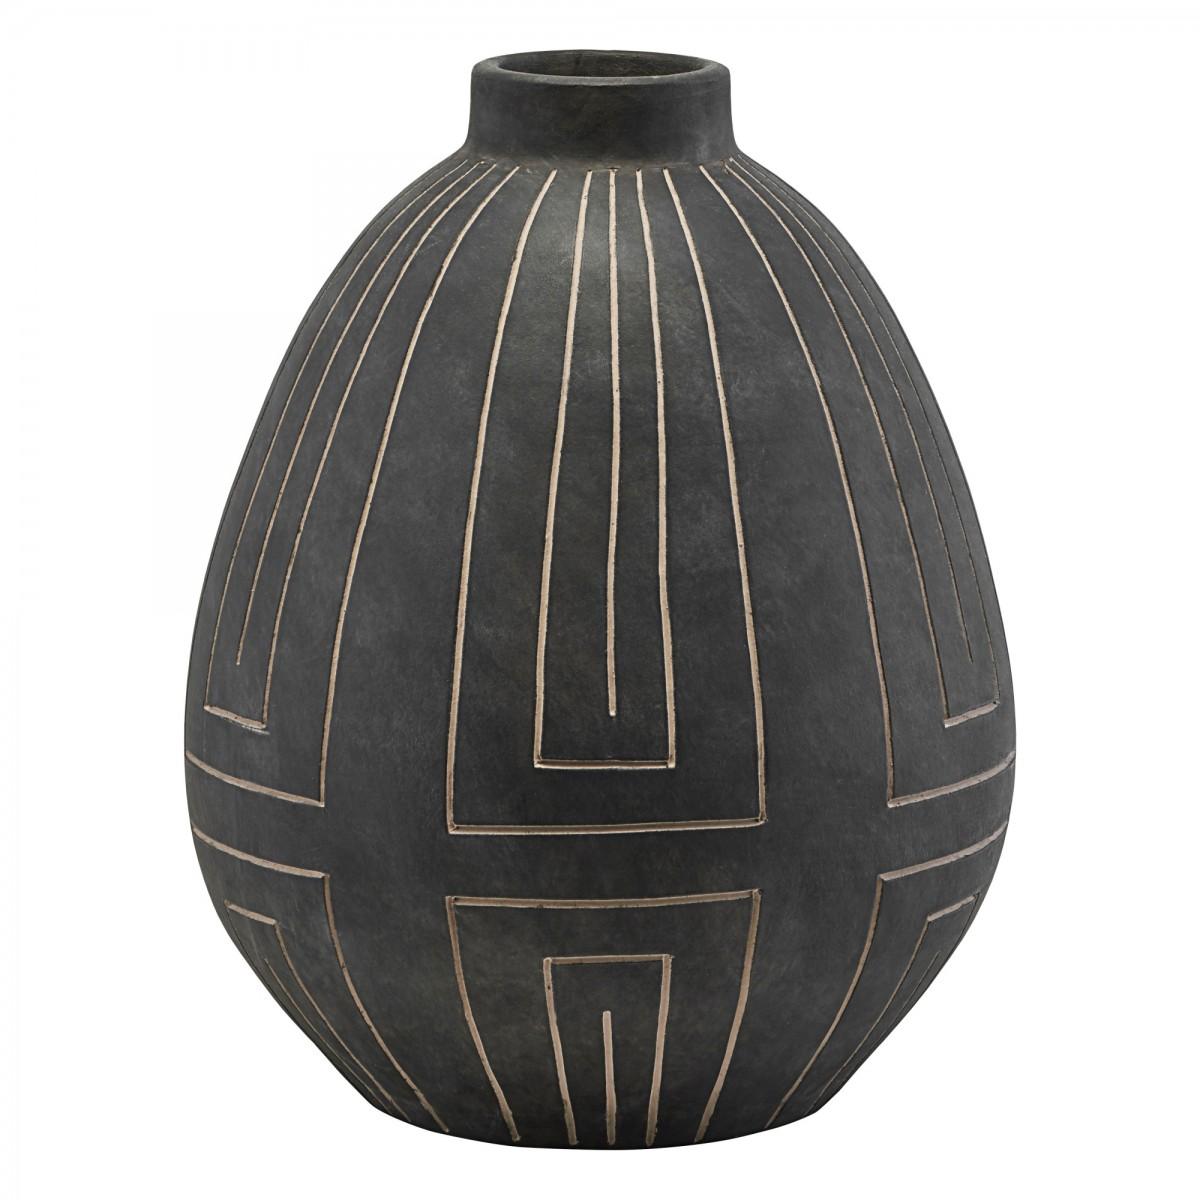 Sandstone Charcoal Grey Vase